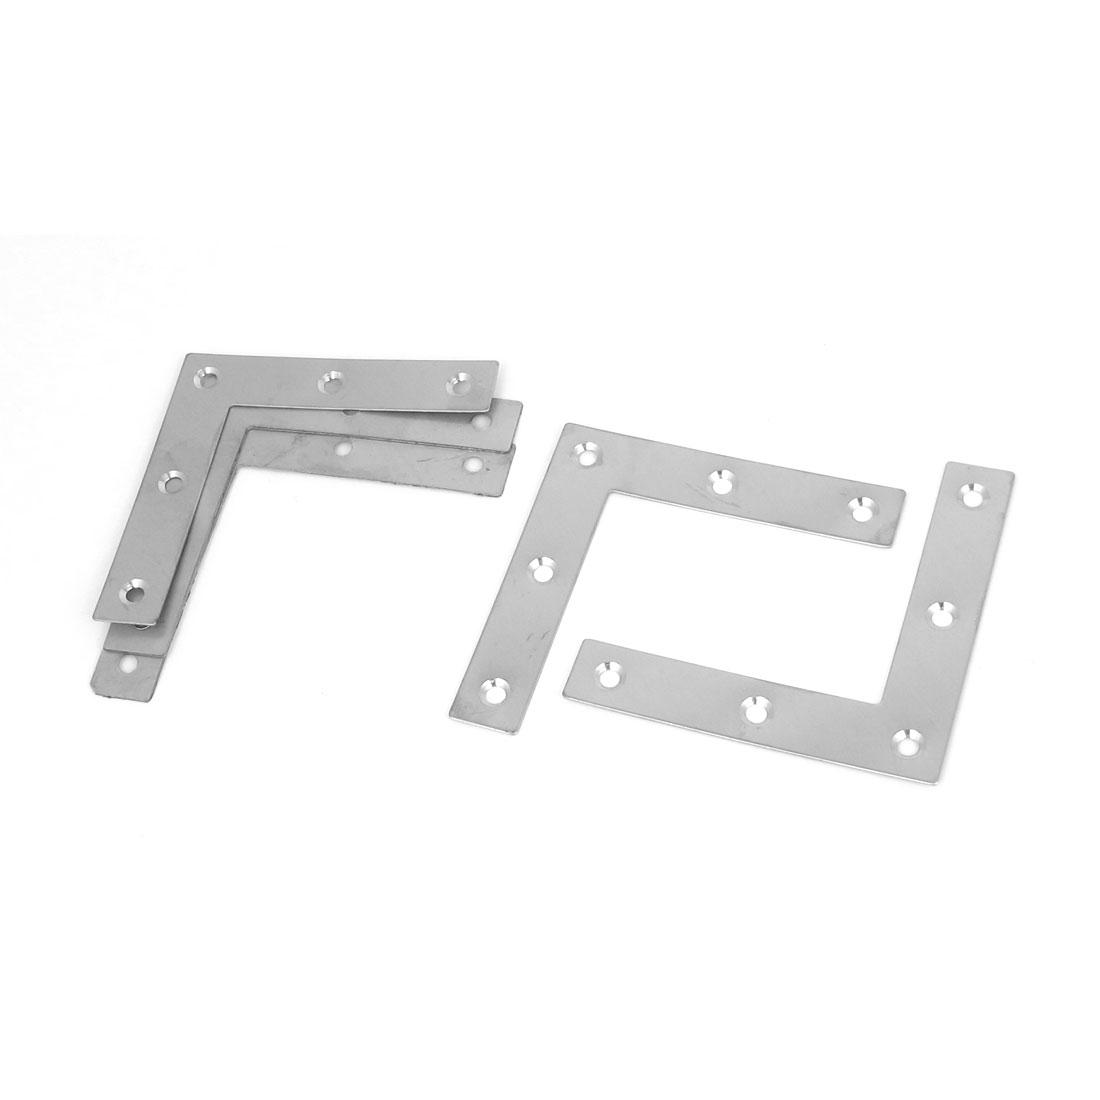 80mmx80mm Flat L Shape Corner Brace Plate Right Angle Bracket Support 5pcs